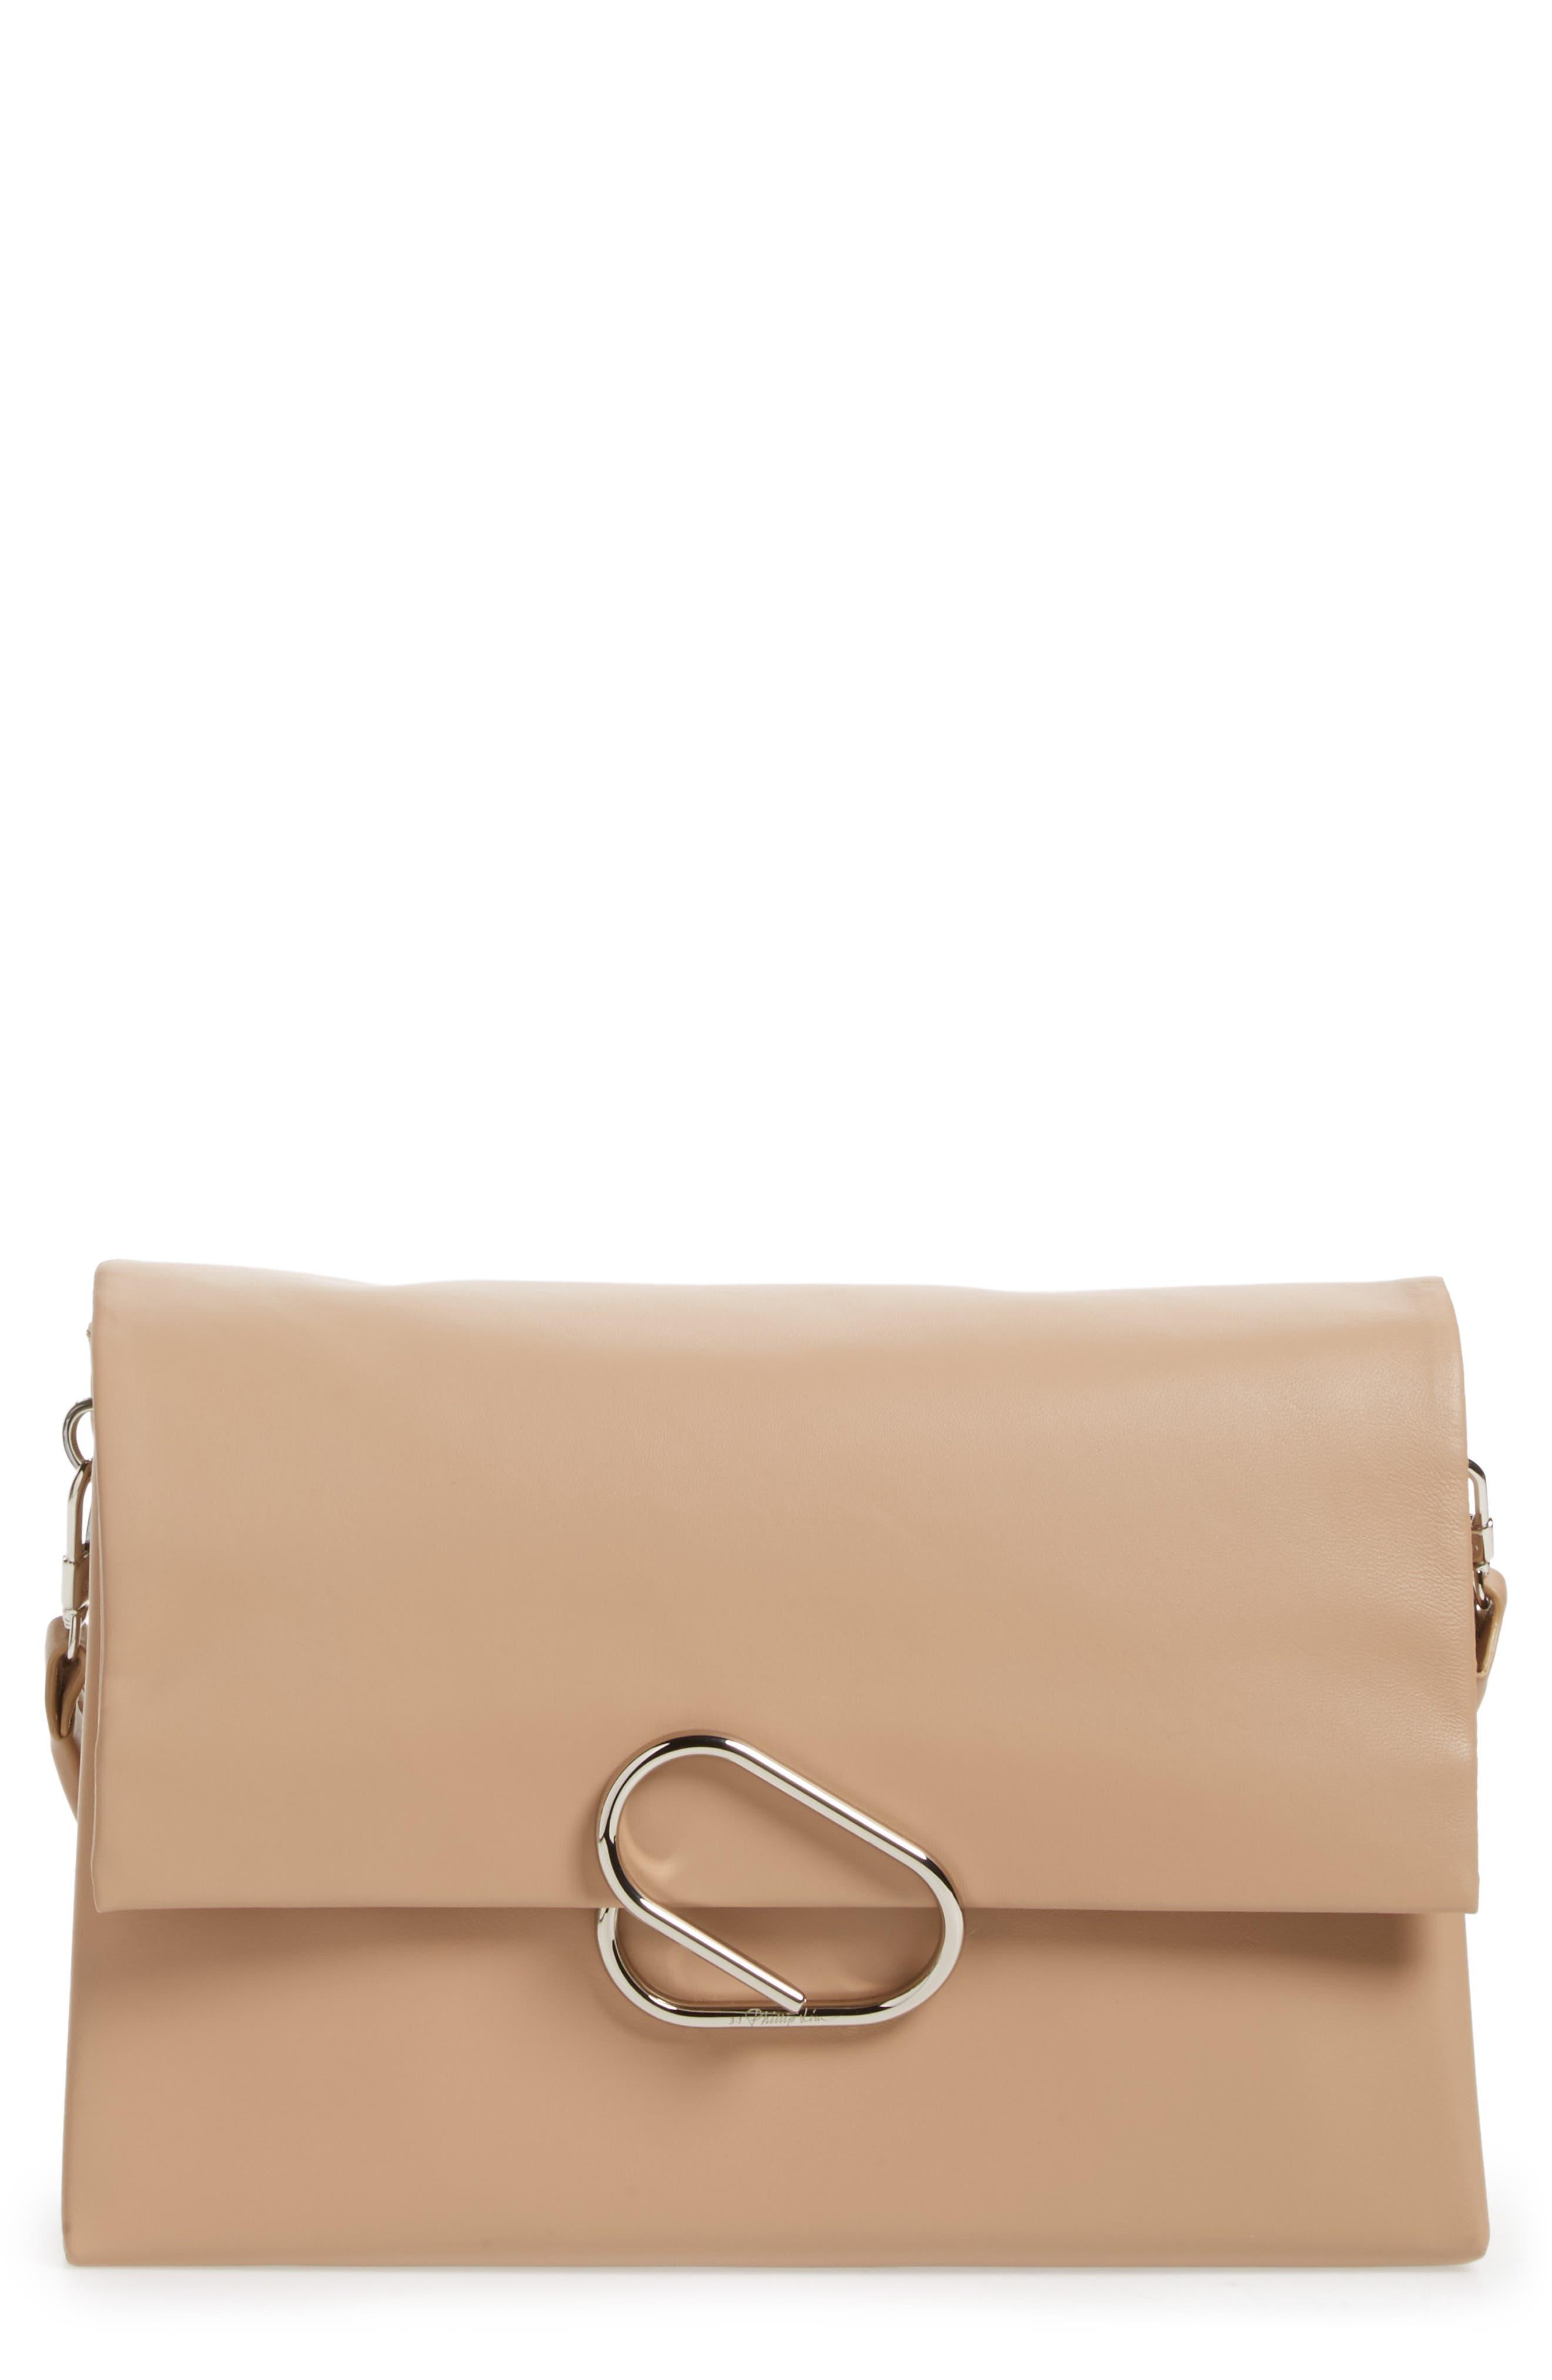 Oversized Alix Flap Leather Shoulder Bag,                         Main,                         color, Fawn